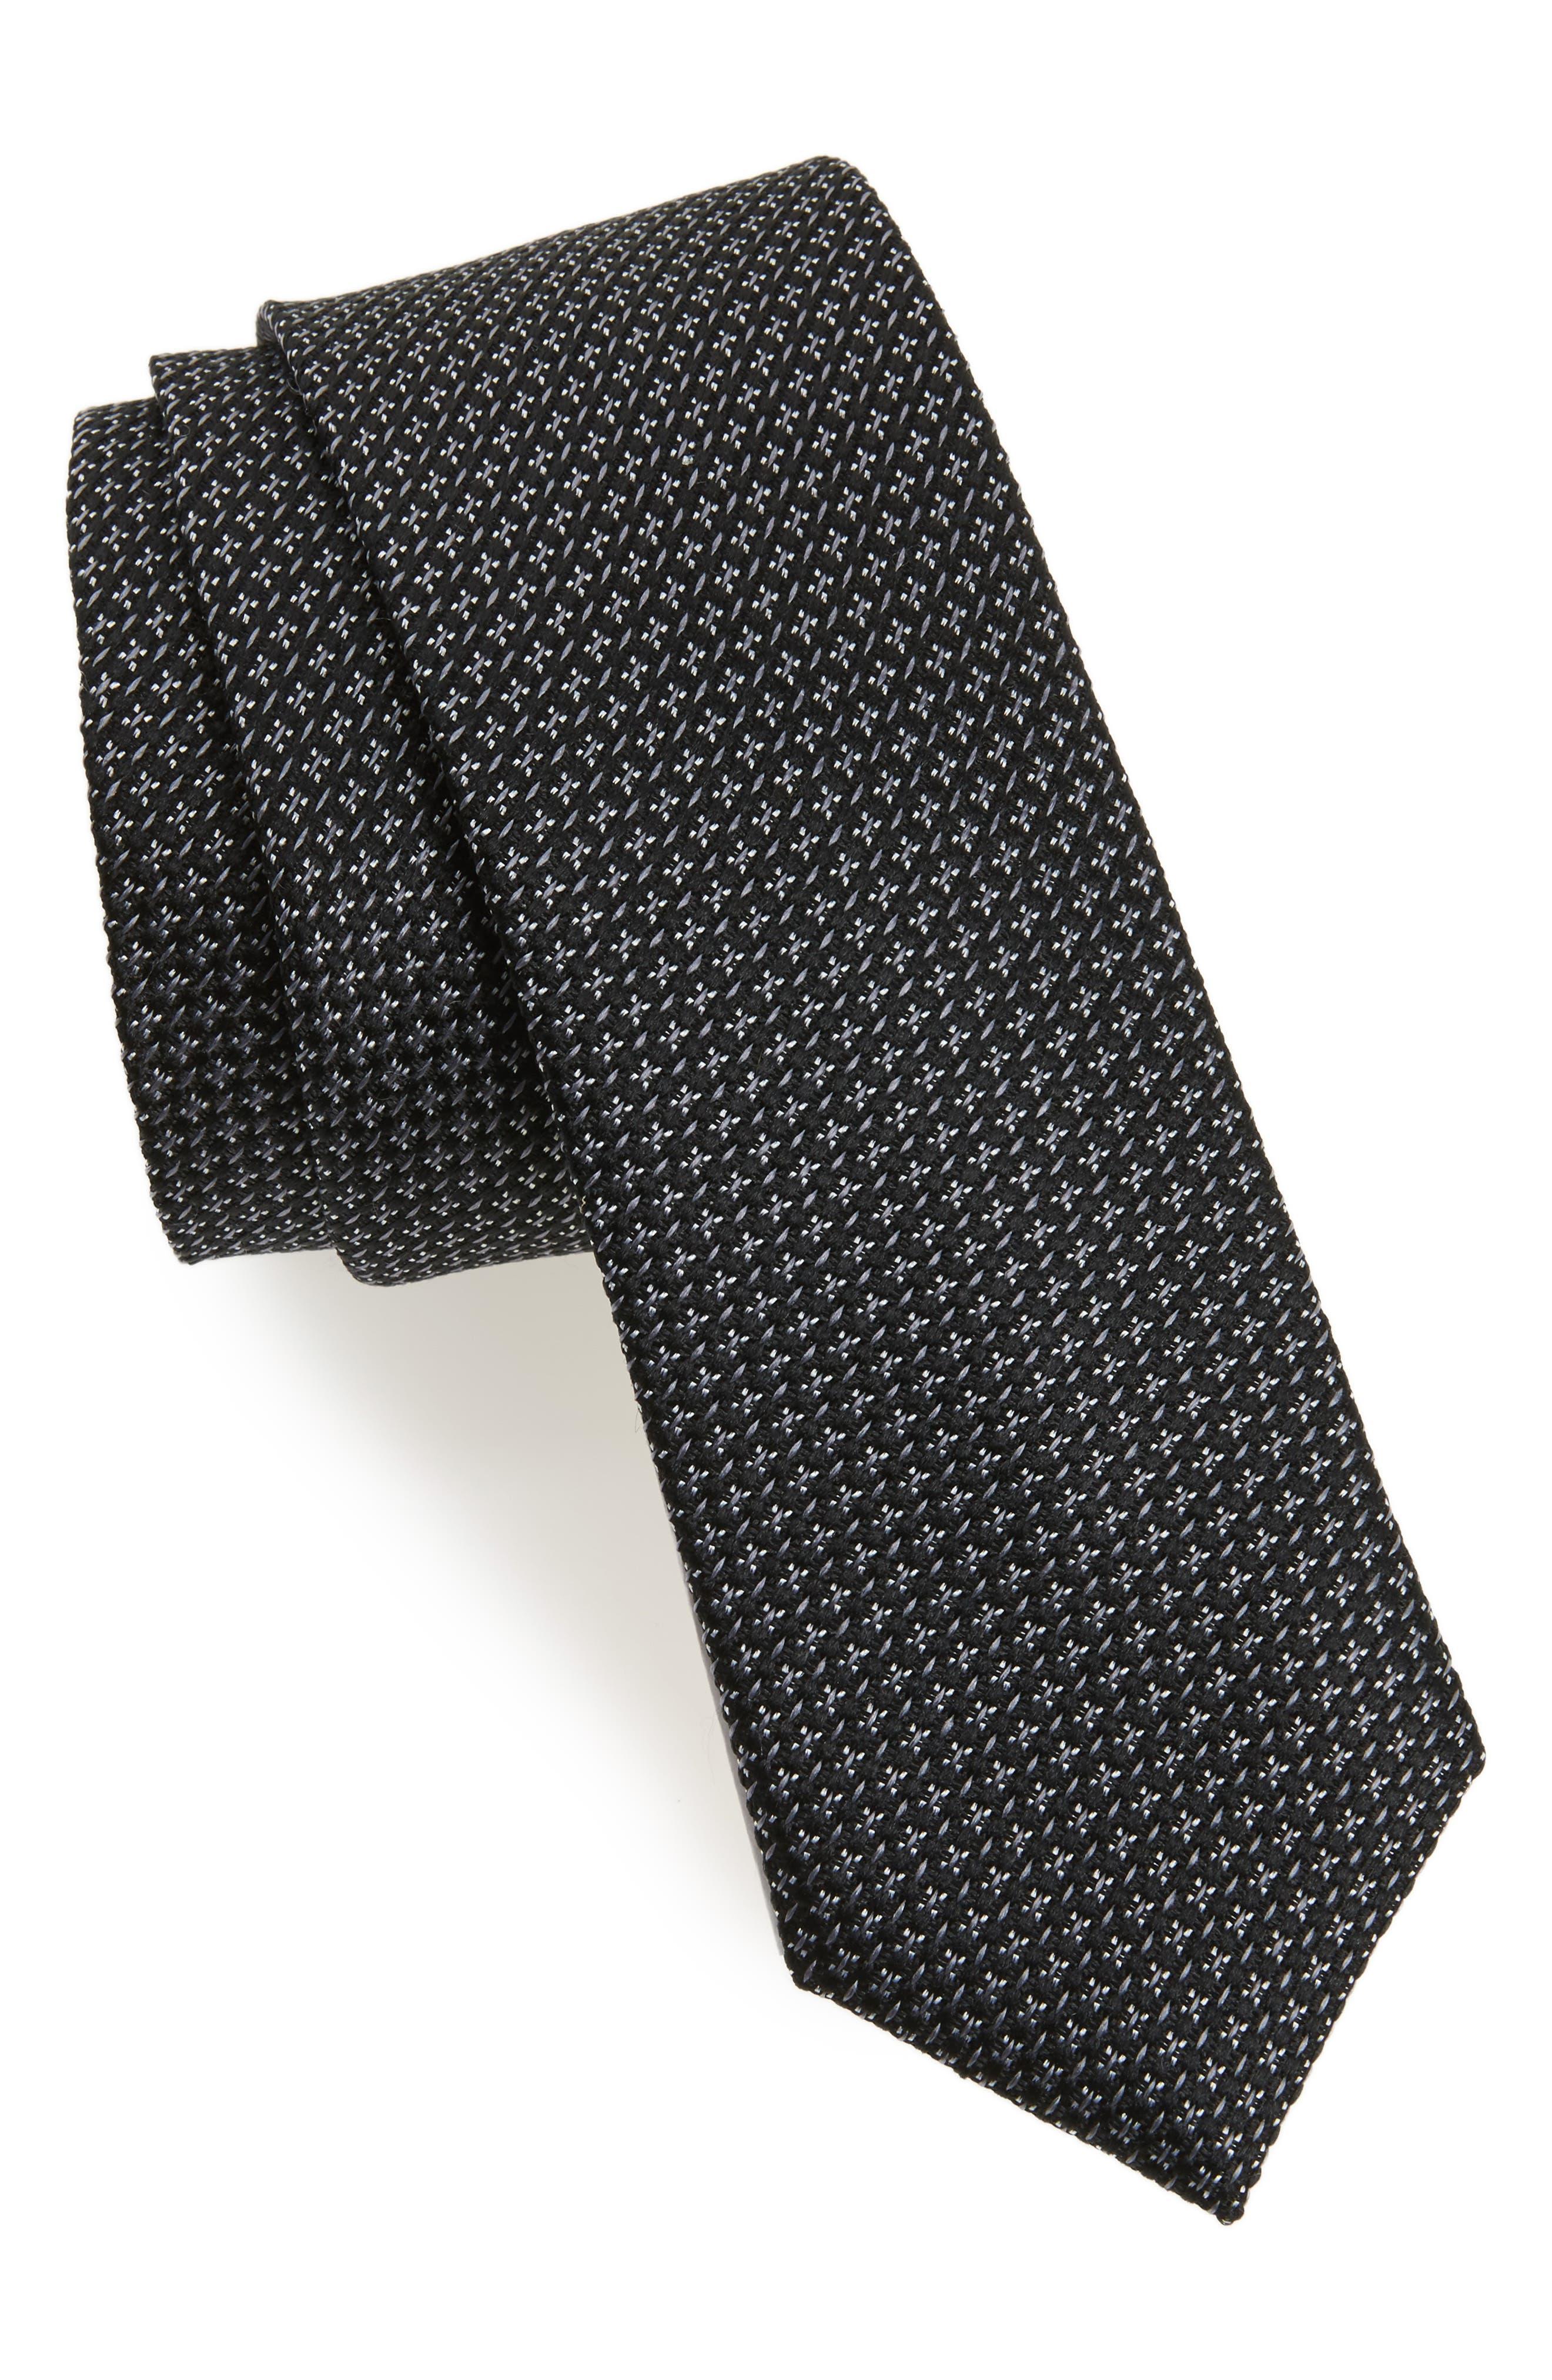 Knitex Solid Silk Tie,                             Main thumbnail 1, color,                             001